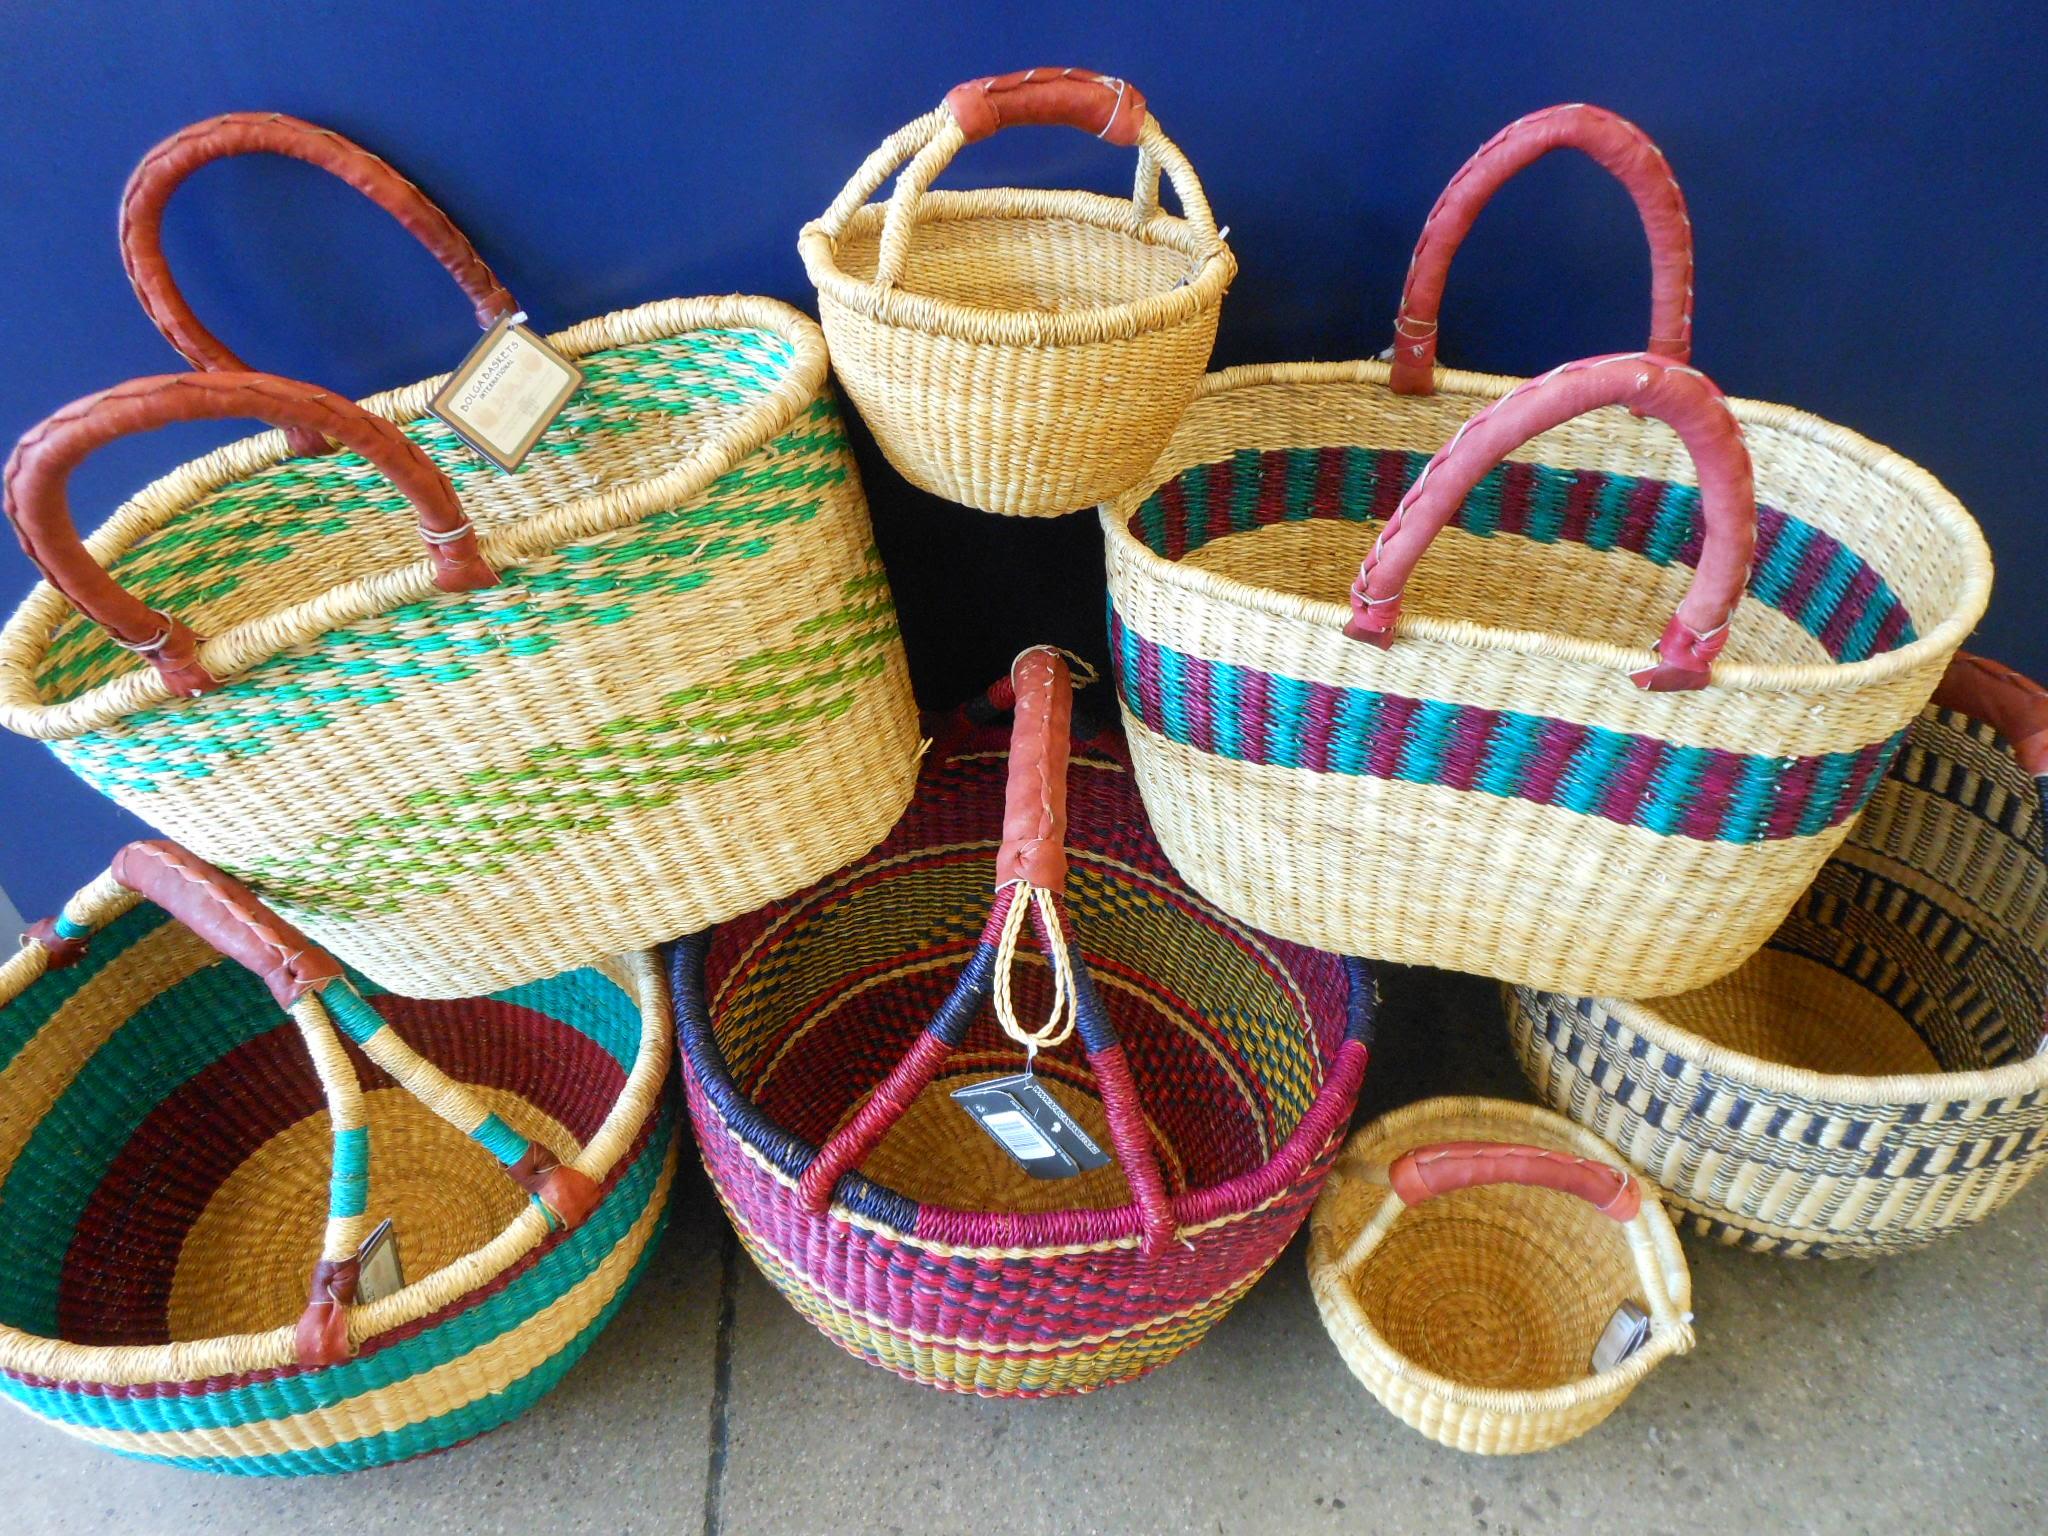 Handmade Ghana Baskets : Frafra gurune people the hardworking agrarian basket